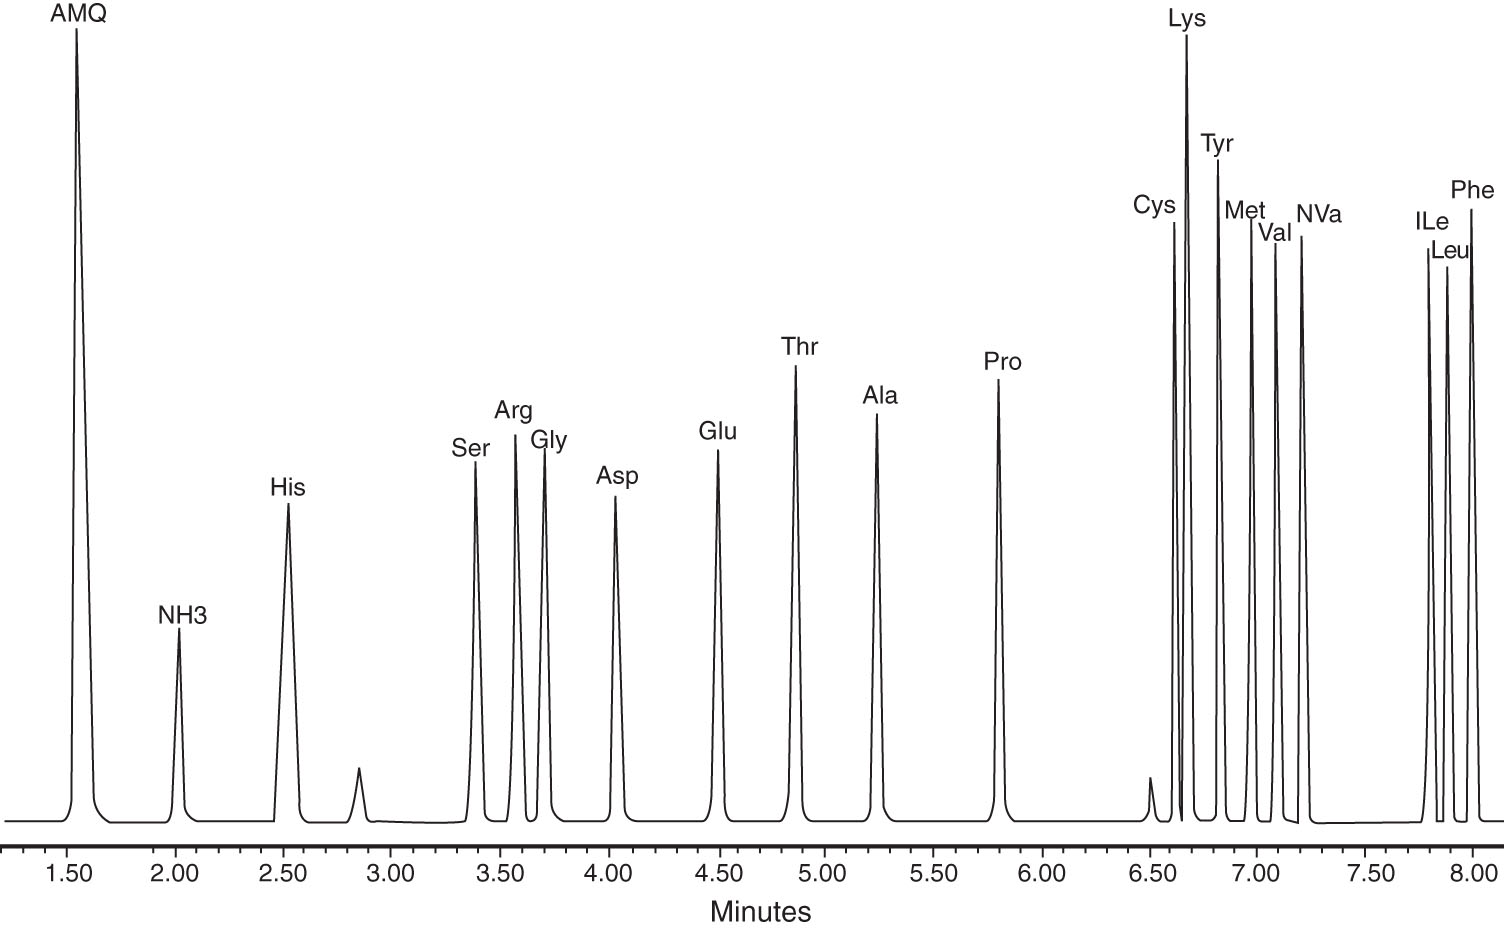 UPLC chromatograph